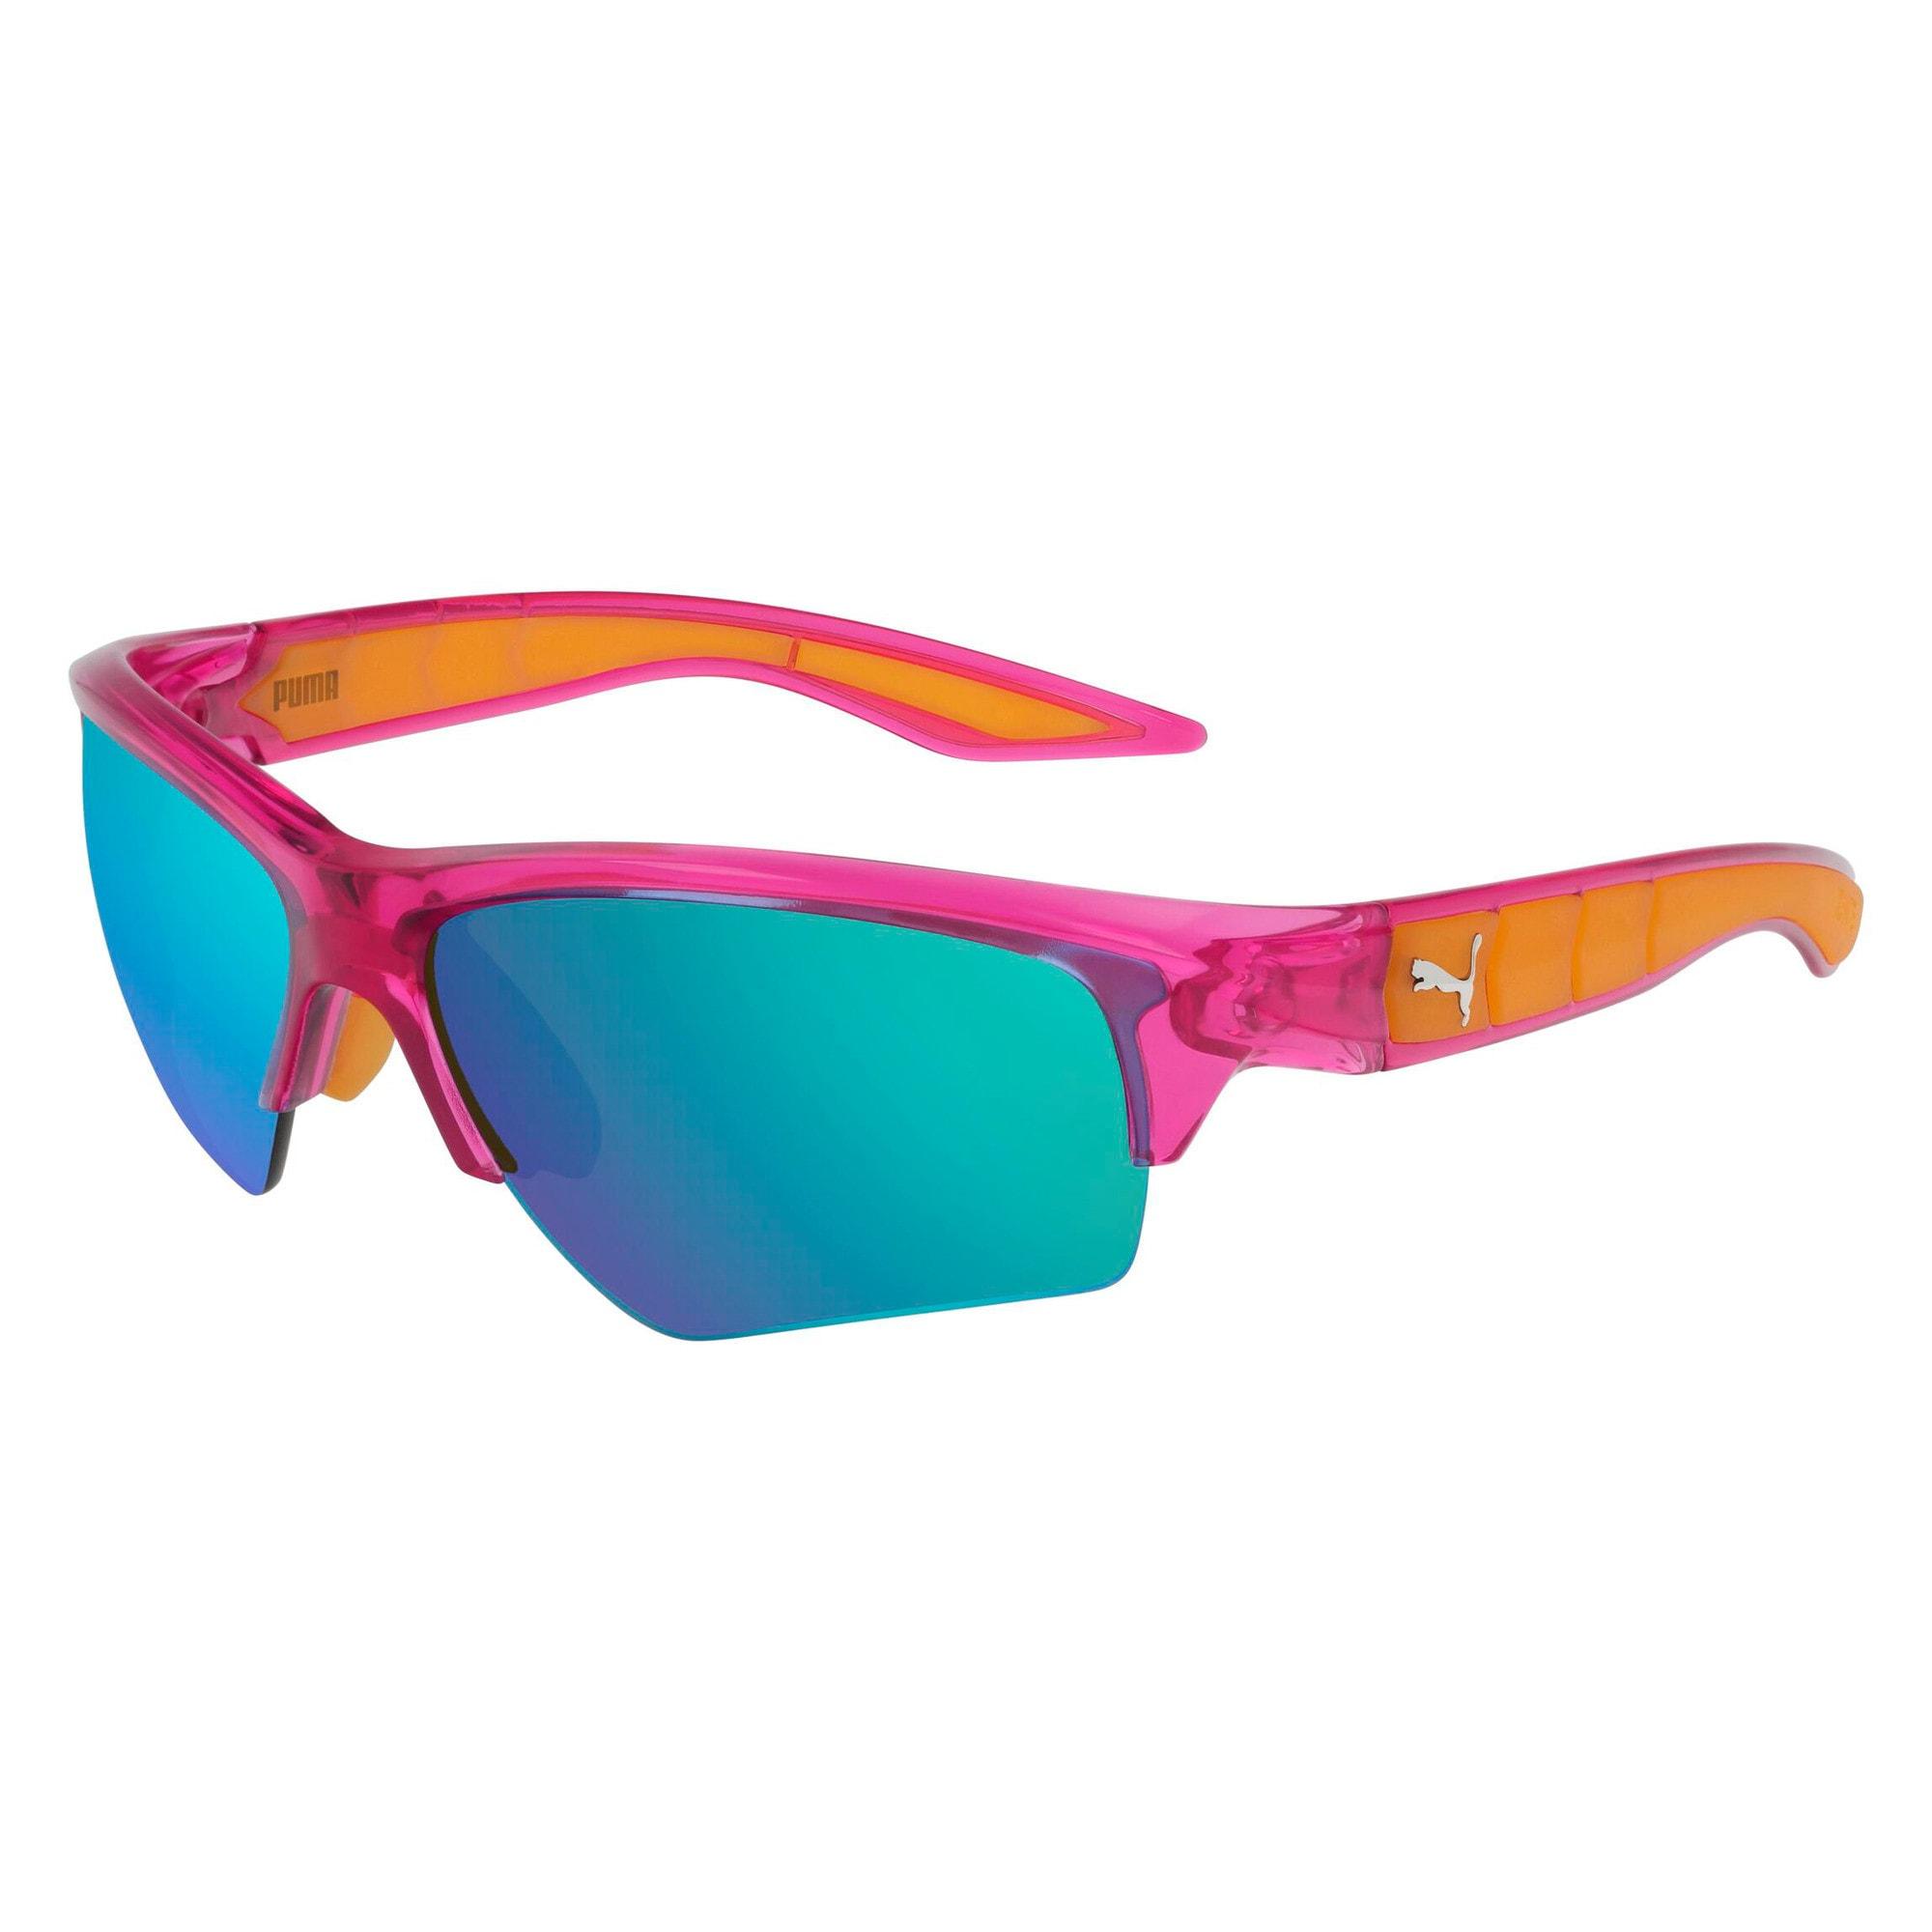 Thumbnail 1 of Wake Sports Sunglasses, FUCHSIA-FUCHSIALIGHT-BLUE, medium